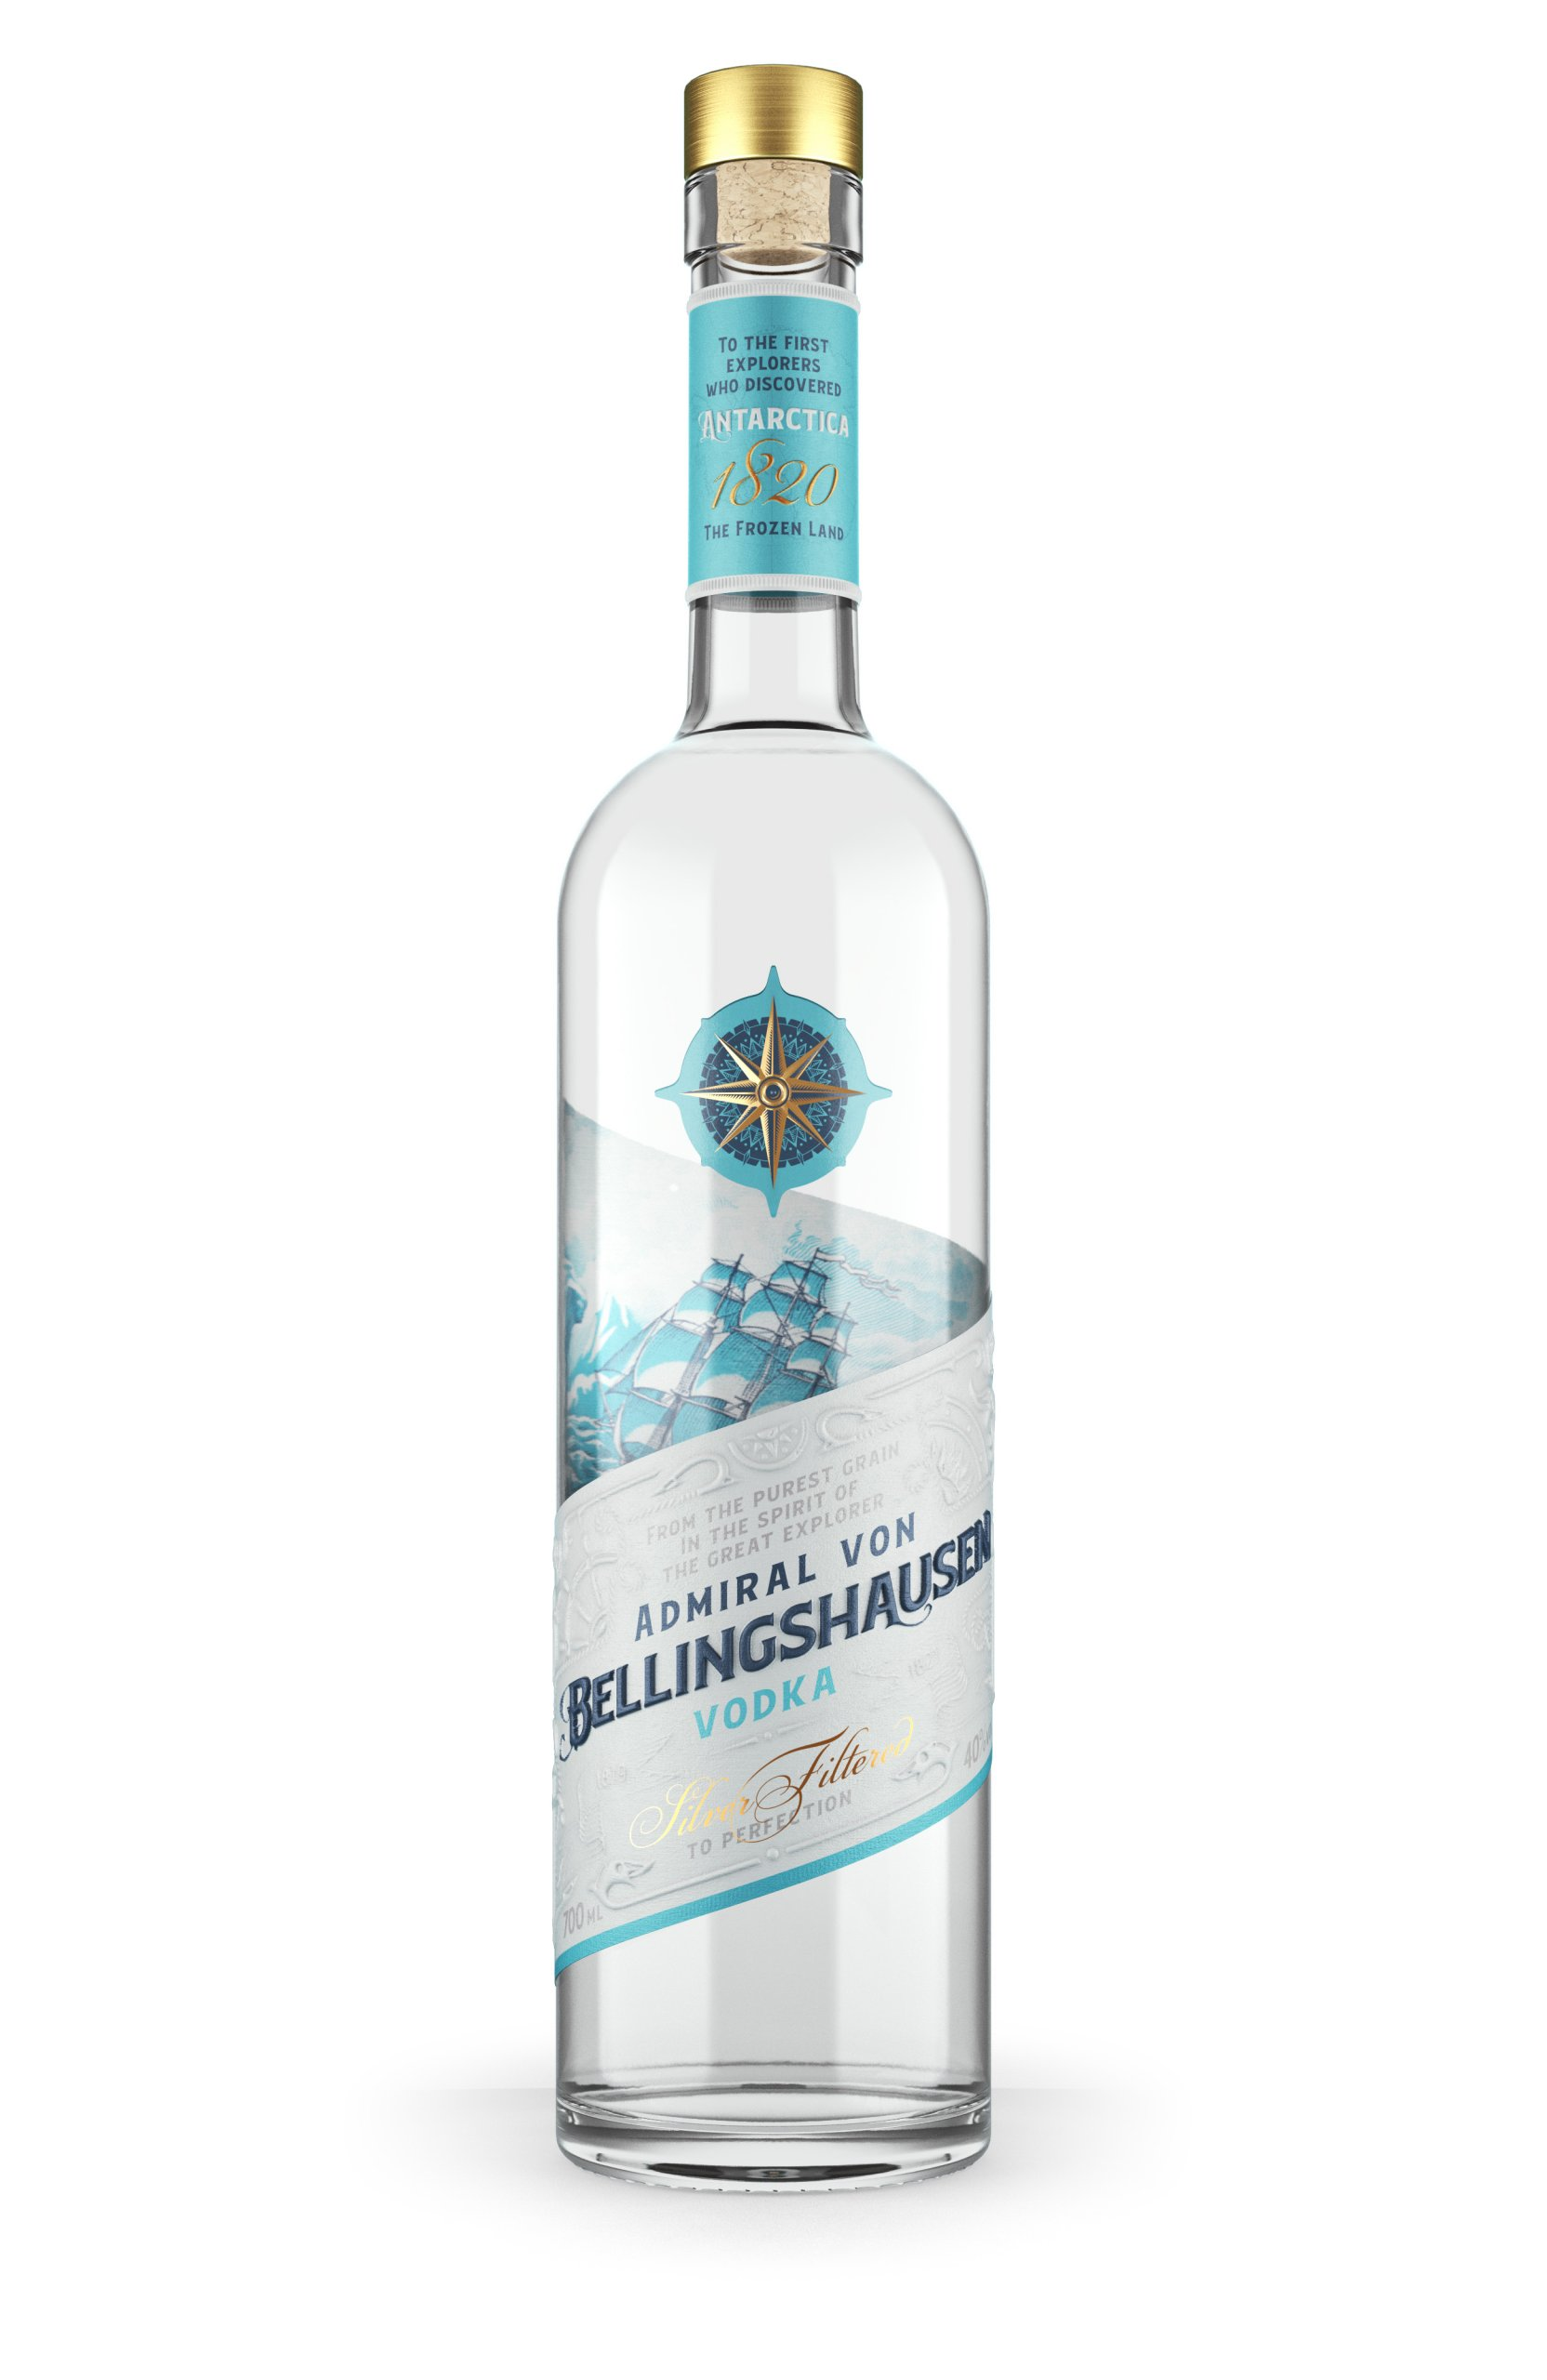 Bellingshausen pudel